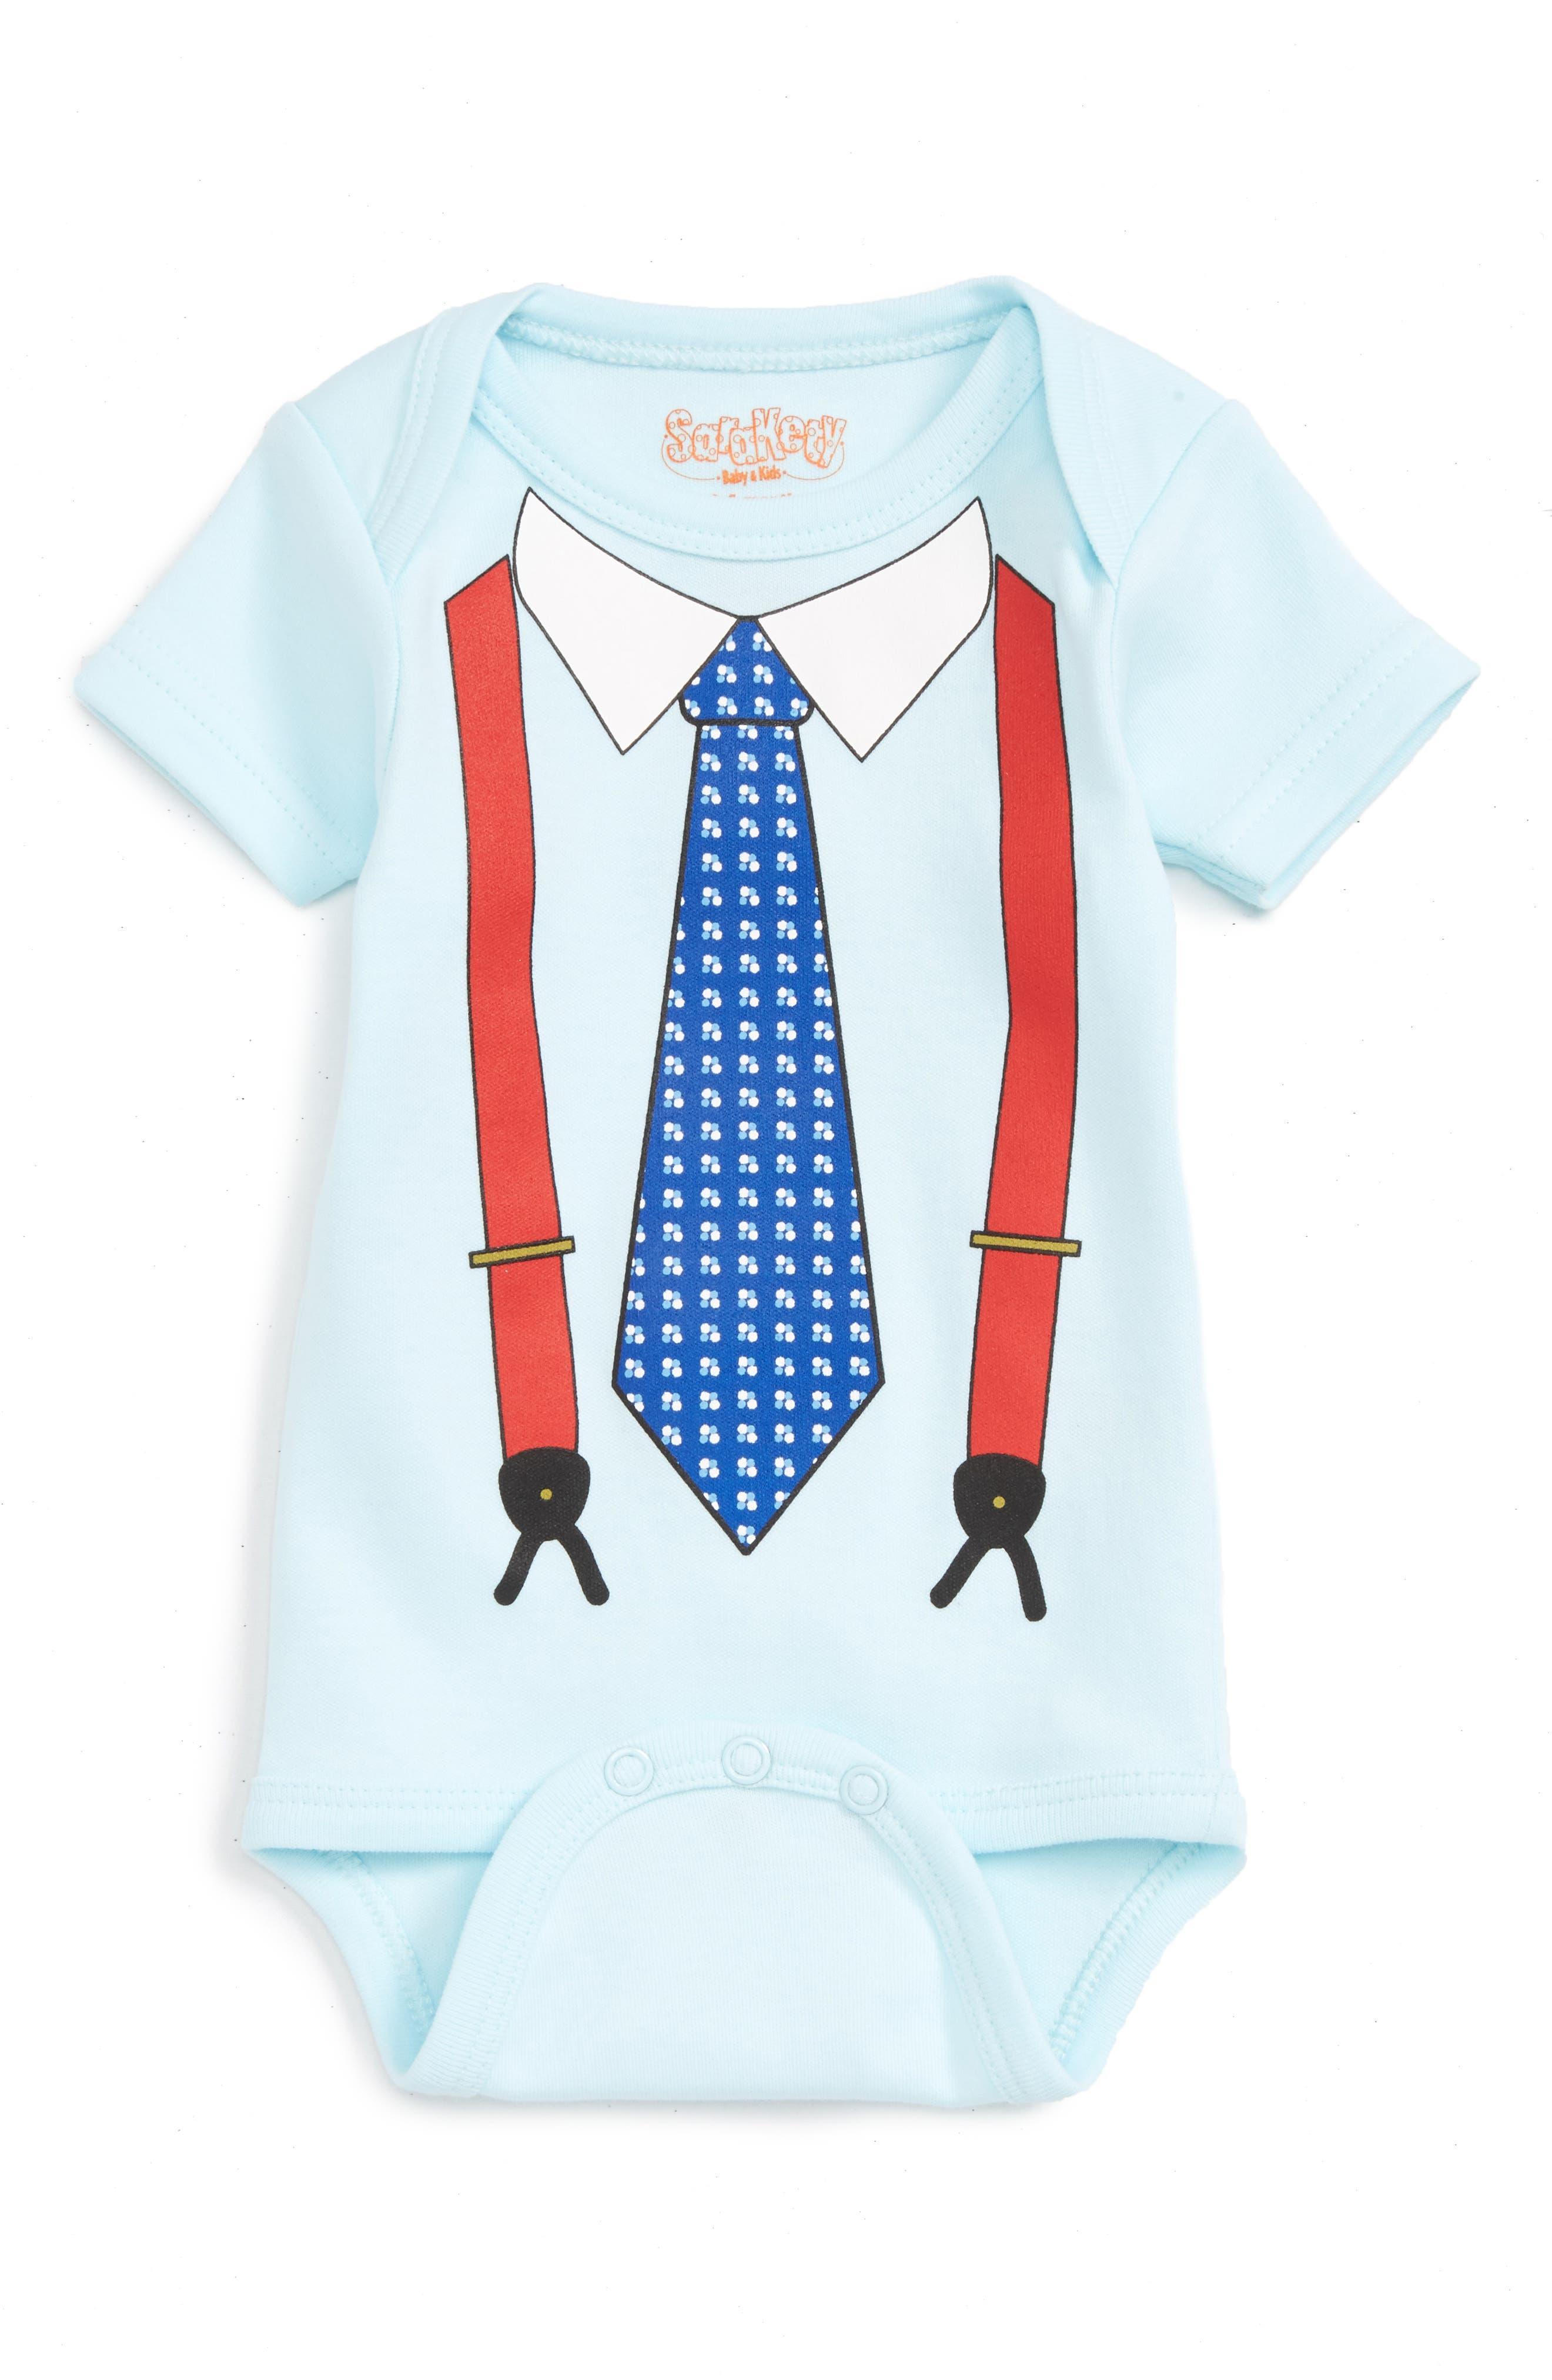 Main Image - Sara Kety Baby & Kids Graphic Print Bodysuit (Baby Boys)